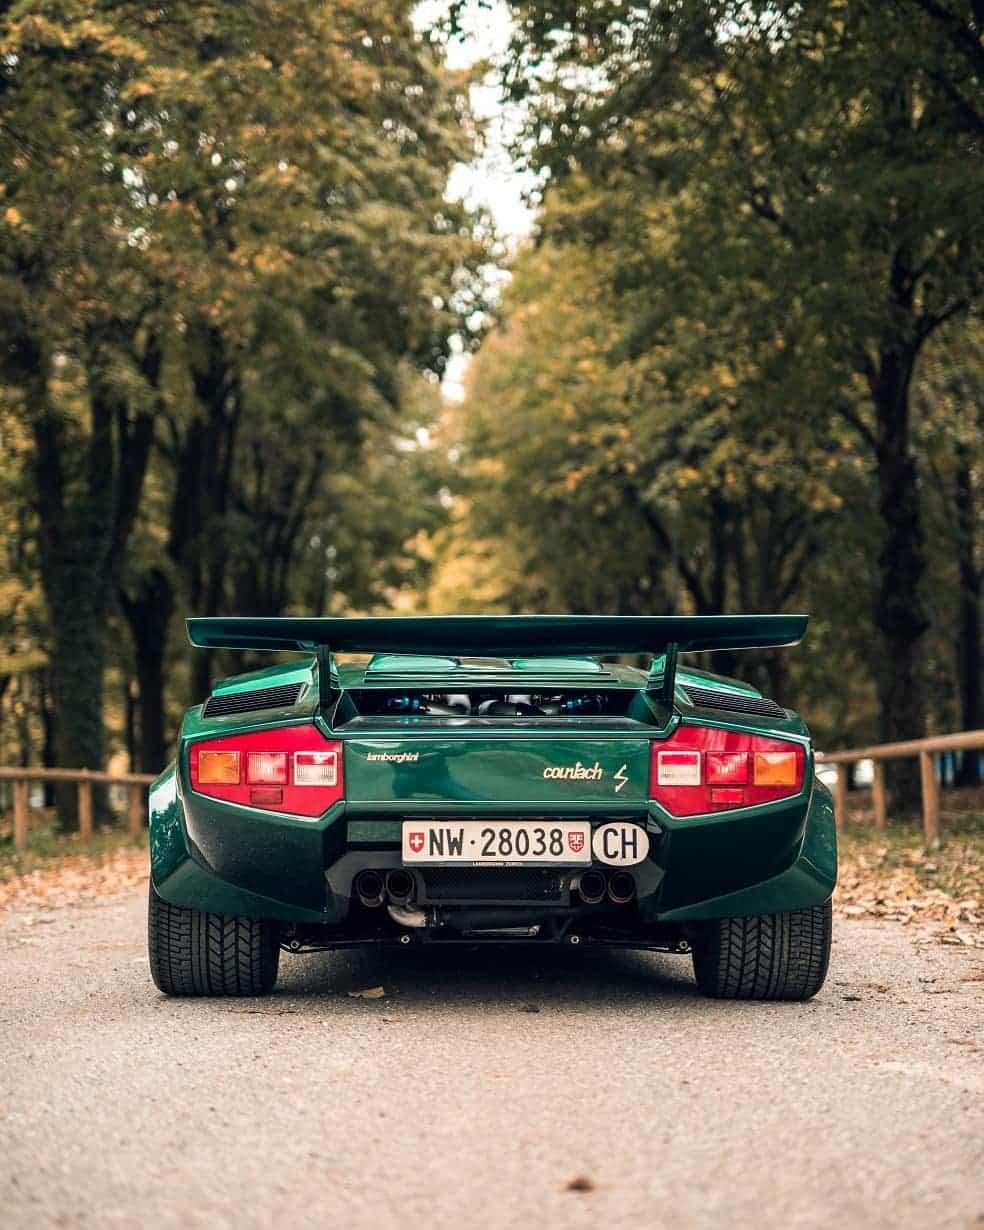 Lamborghini Countach @davidclementephotography - Image 3